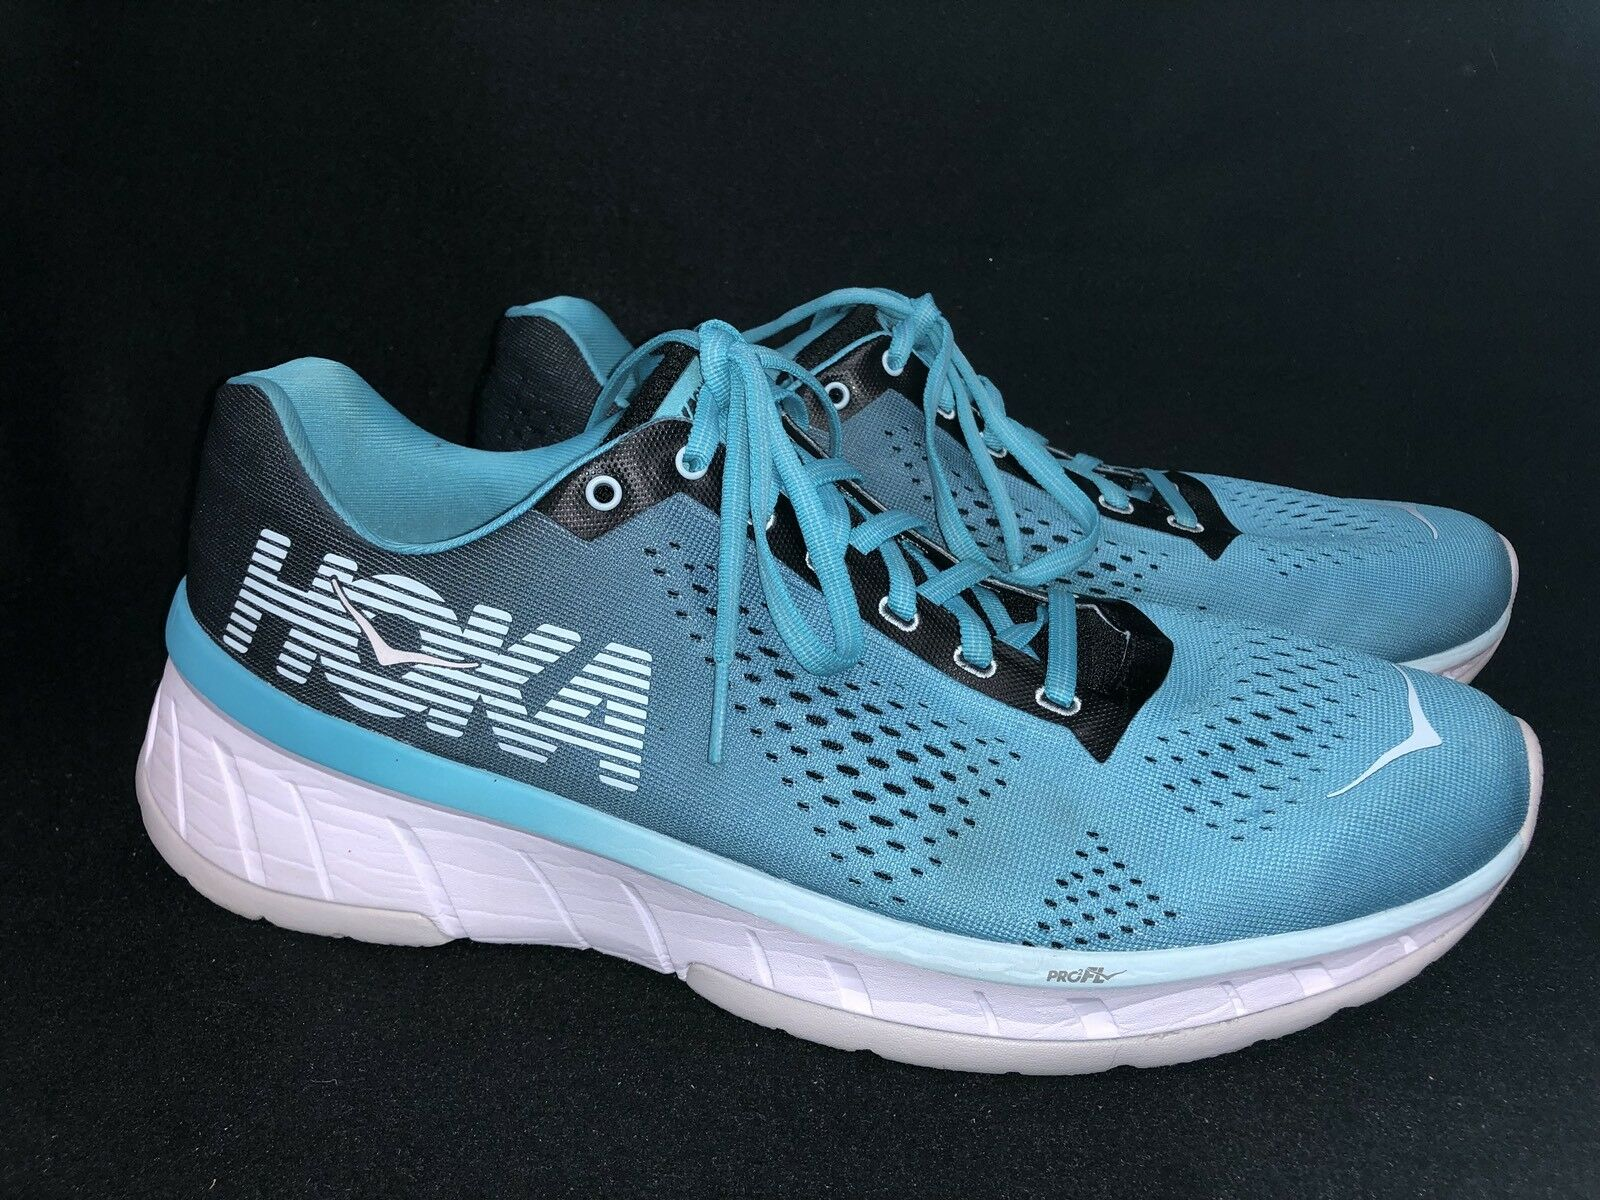 Hoka One One Cavu VINTAGE INDIGO / schuhe HIBISCUS 1019282 Tennis Running schuhe / Lace Up e1fe07